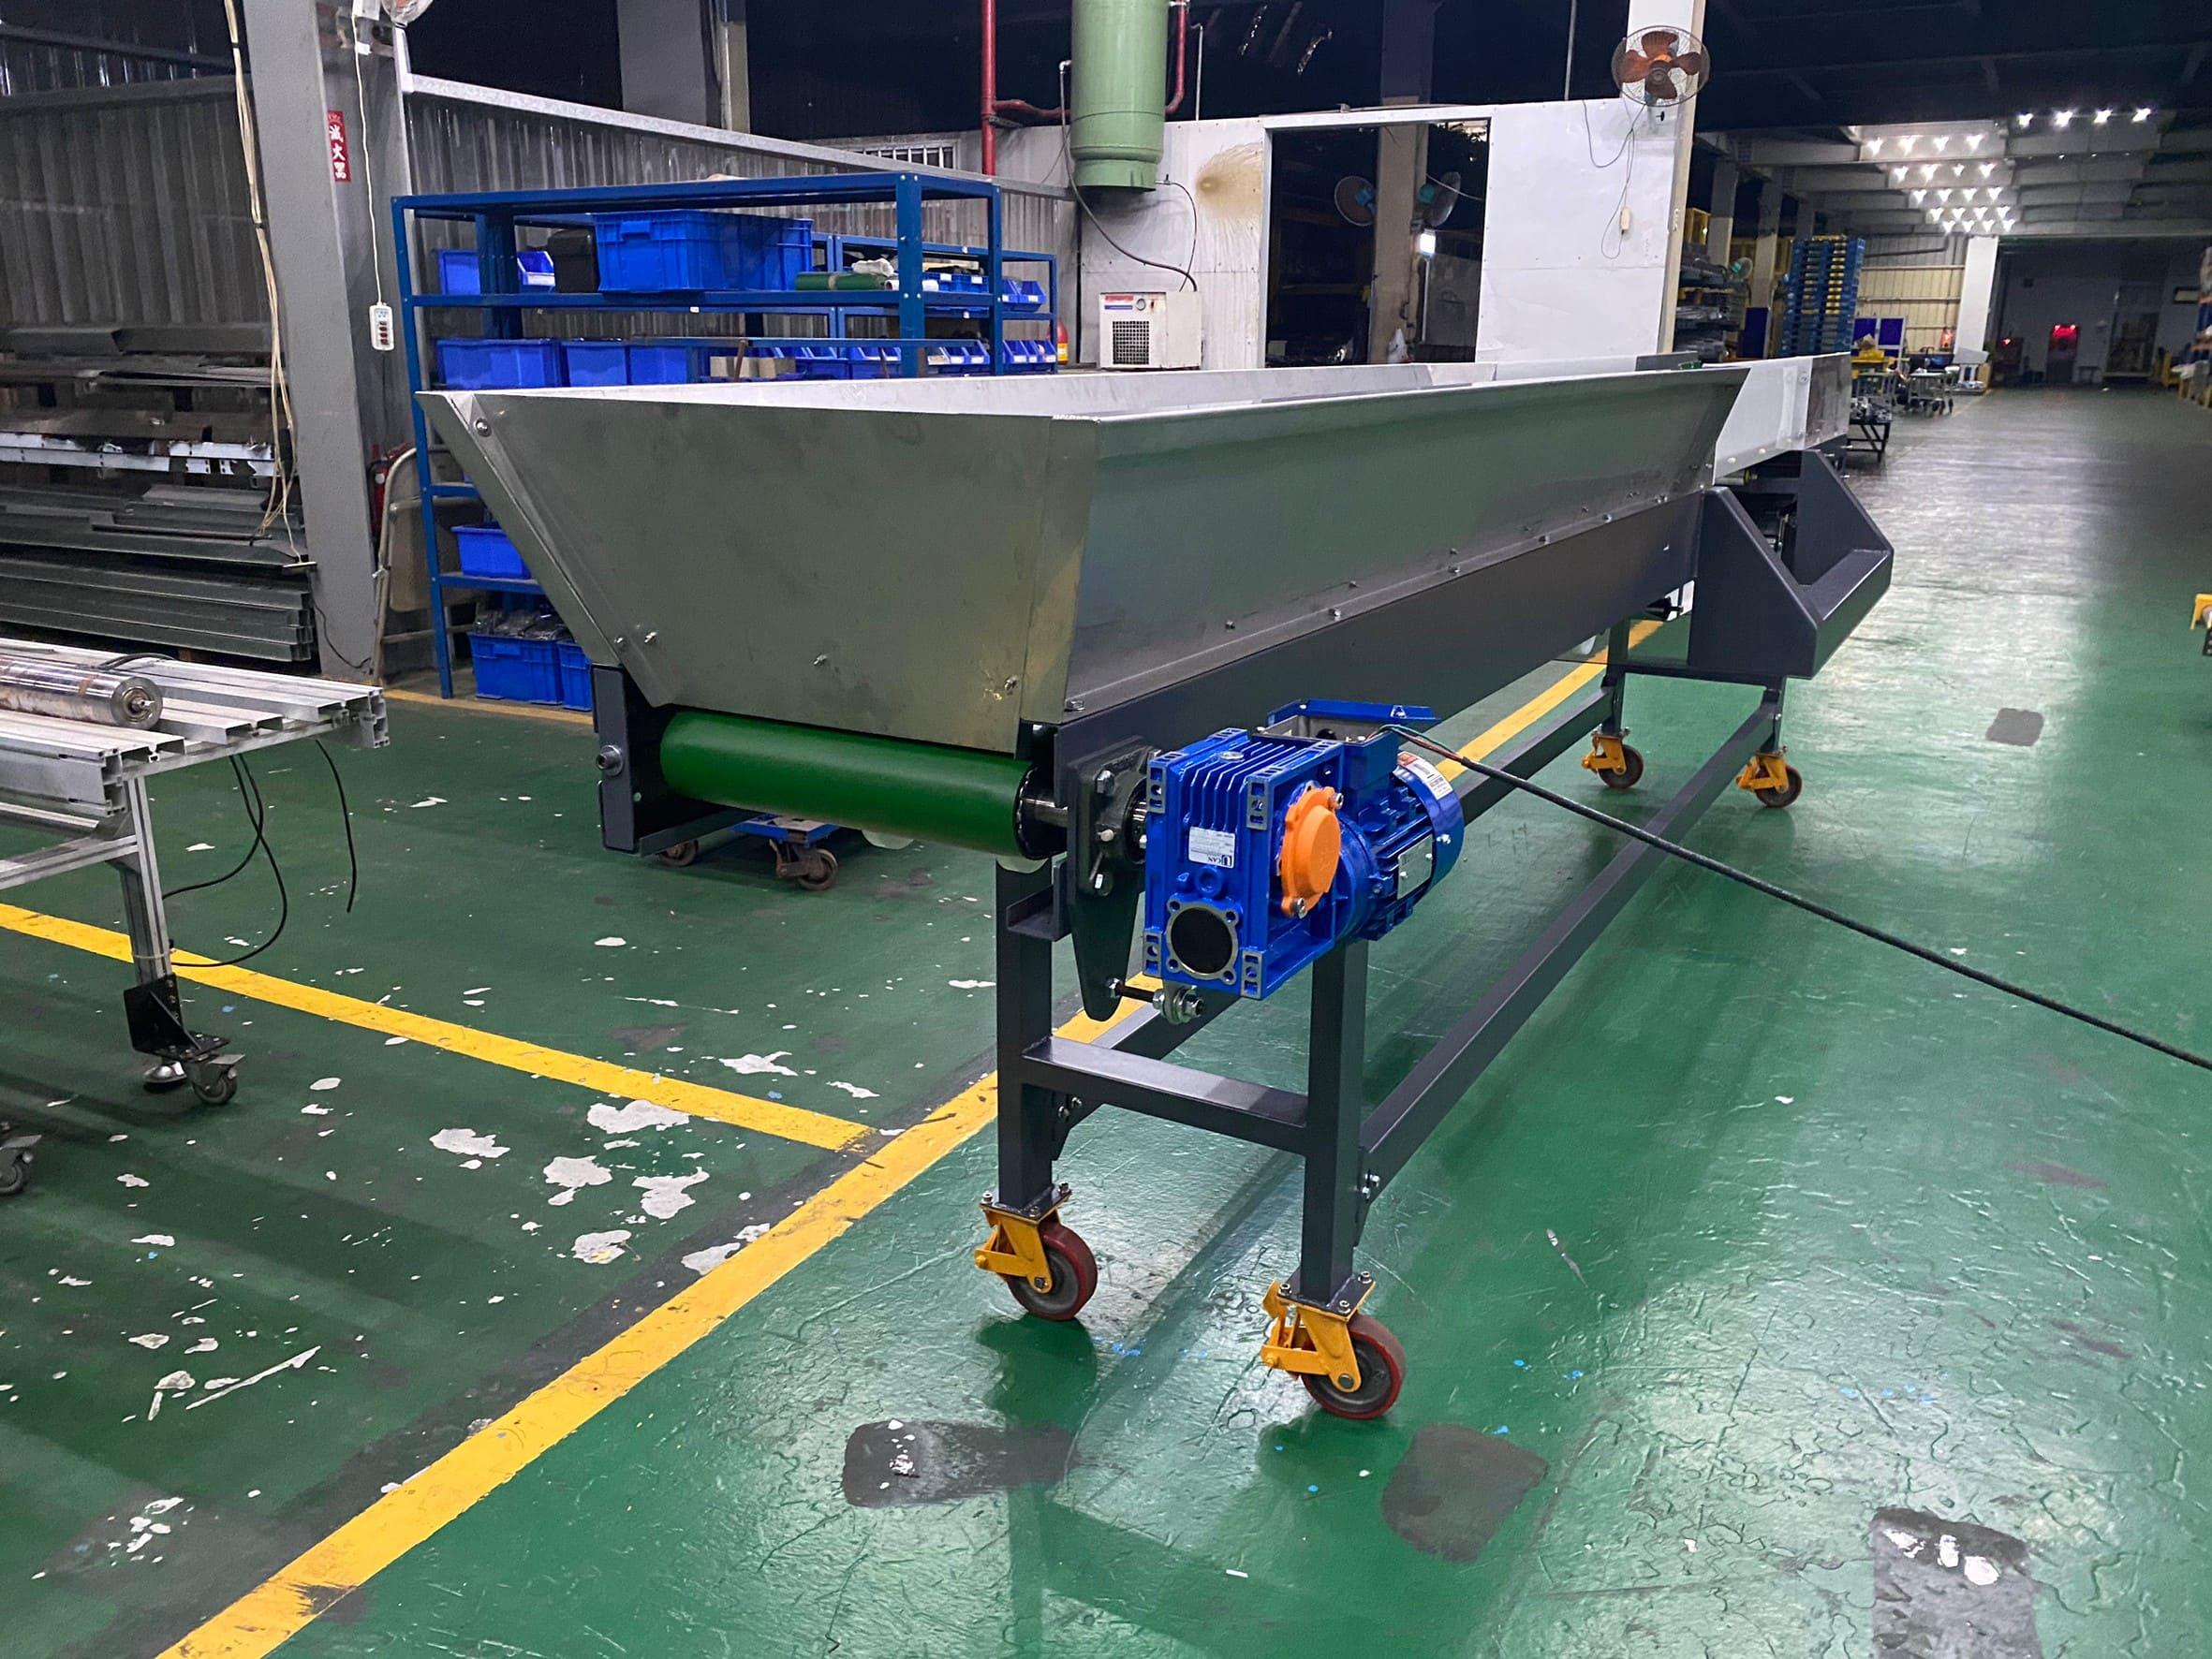 Steel plate type gold inspection belt plane conveyor-Lichen Conveyor Automatic Equipment Co., Ltd.